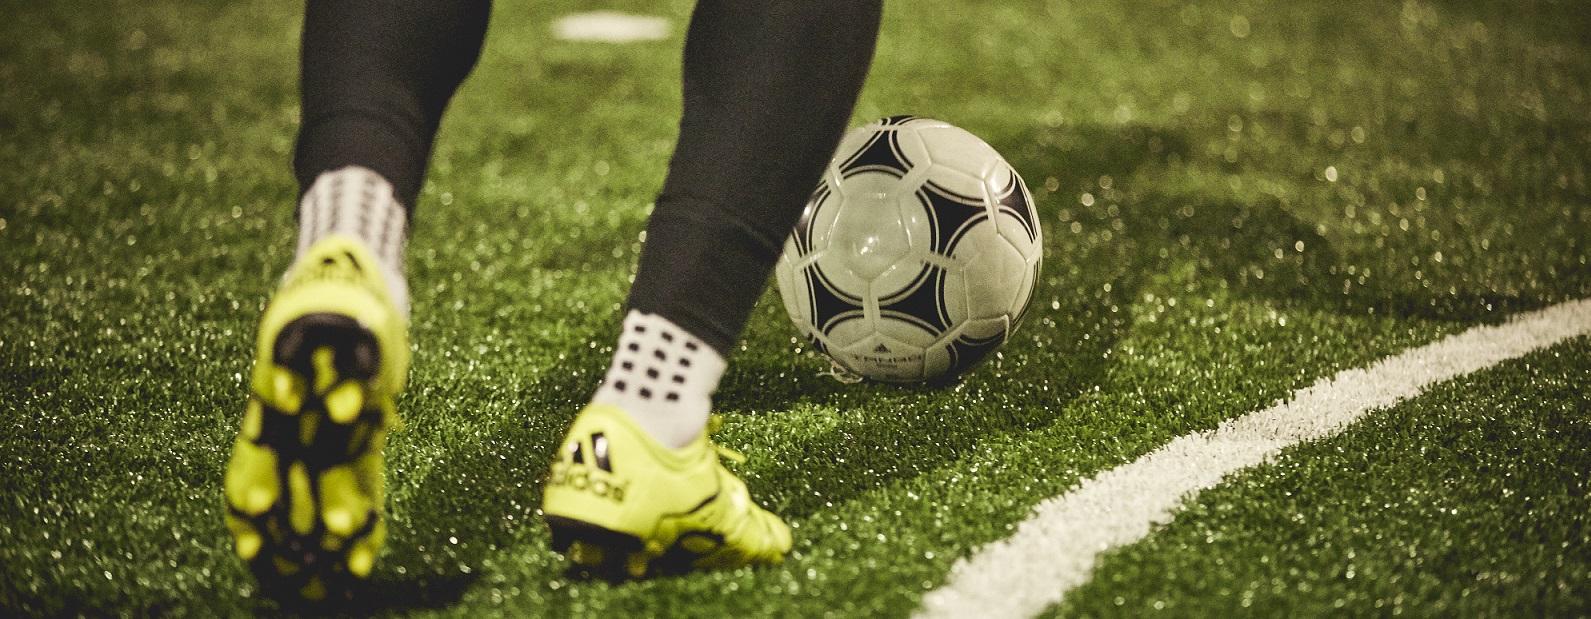 Playfootball and better